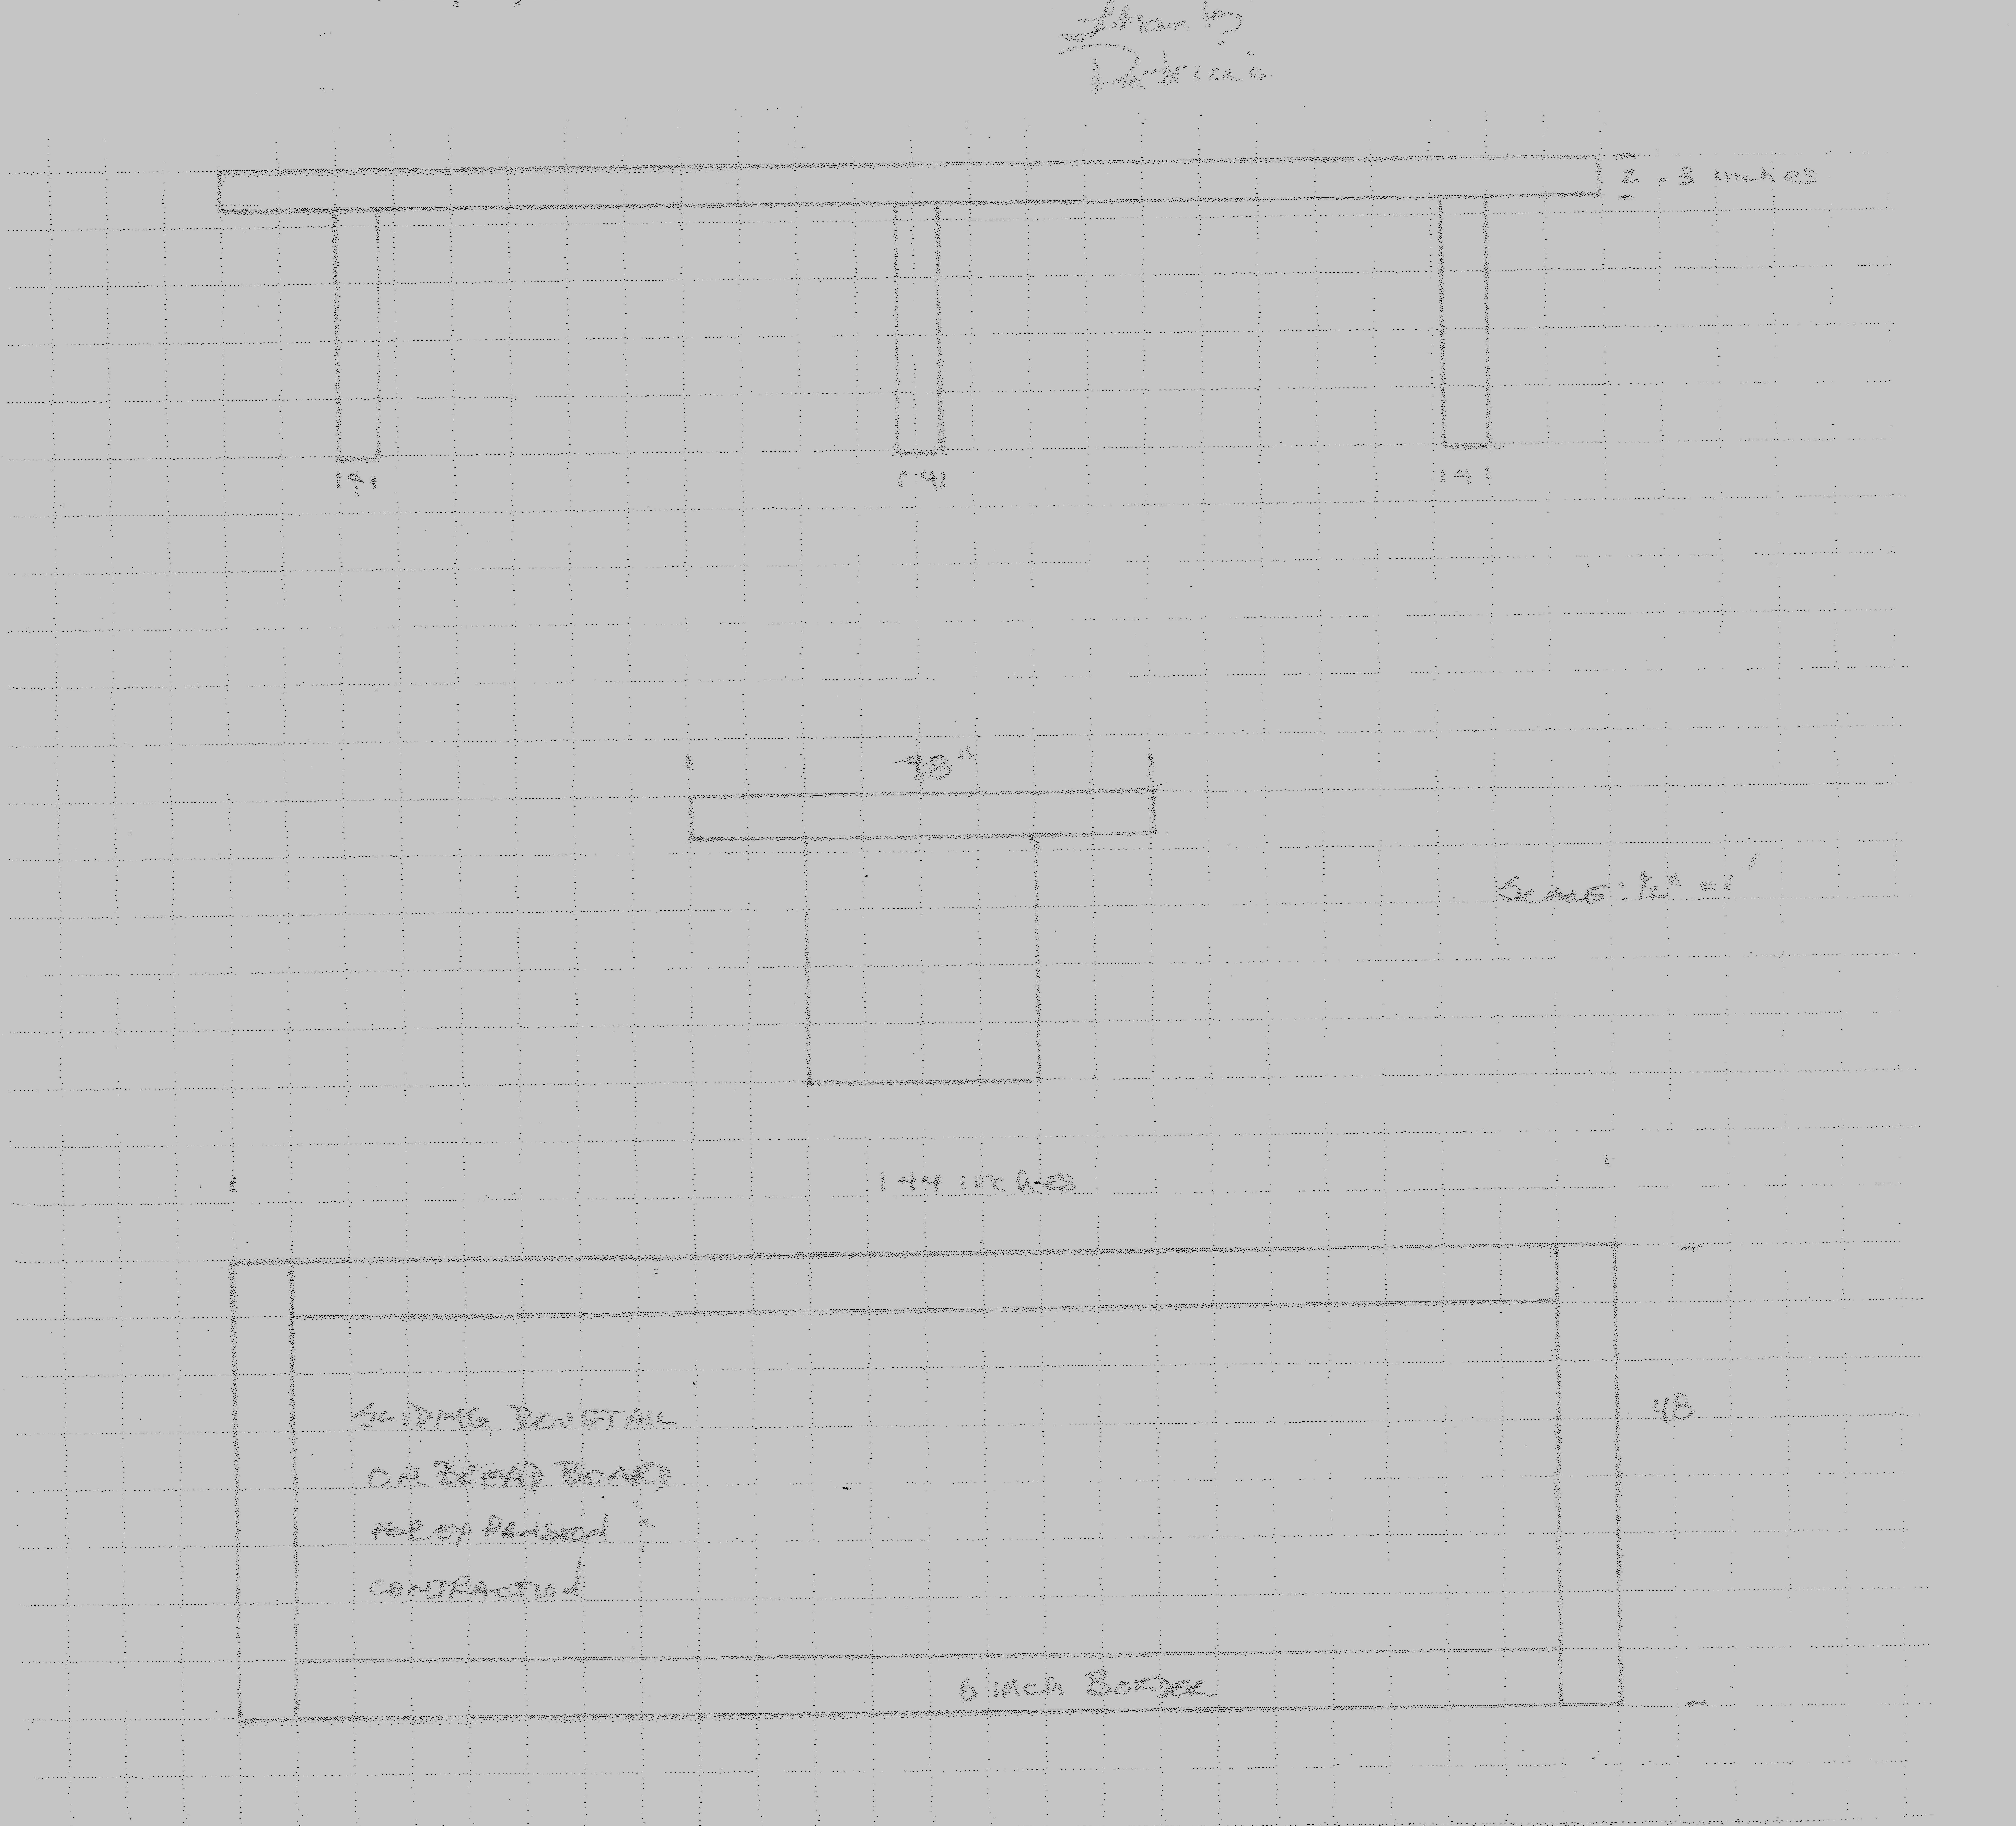 https://0901.nccdn.net/4_2/000/000/038/2d3/Bimacombe-Exterior-Table-Top-9907x8972.jpg